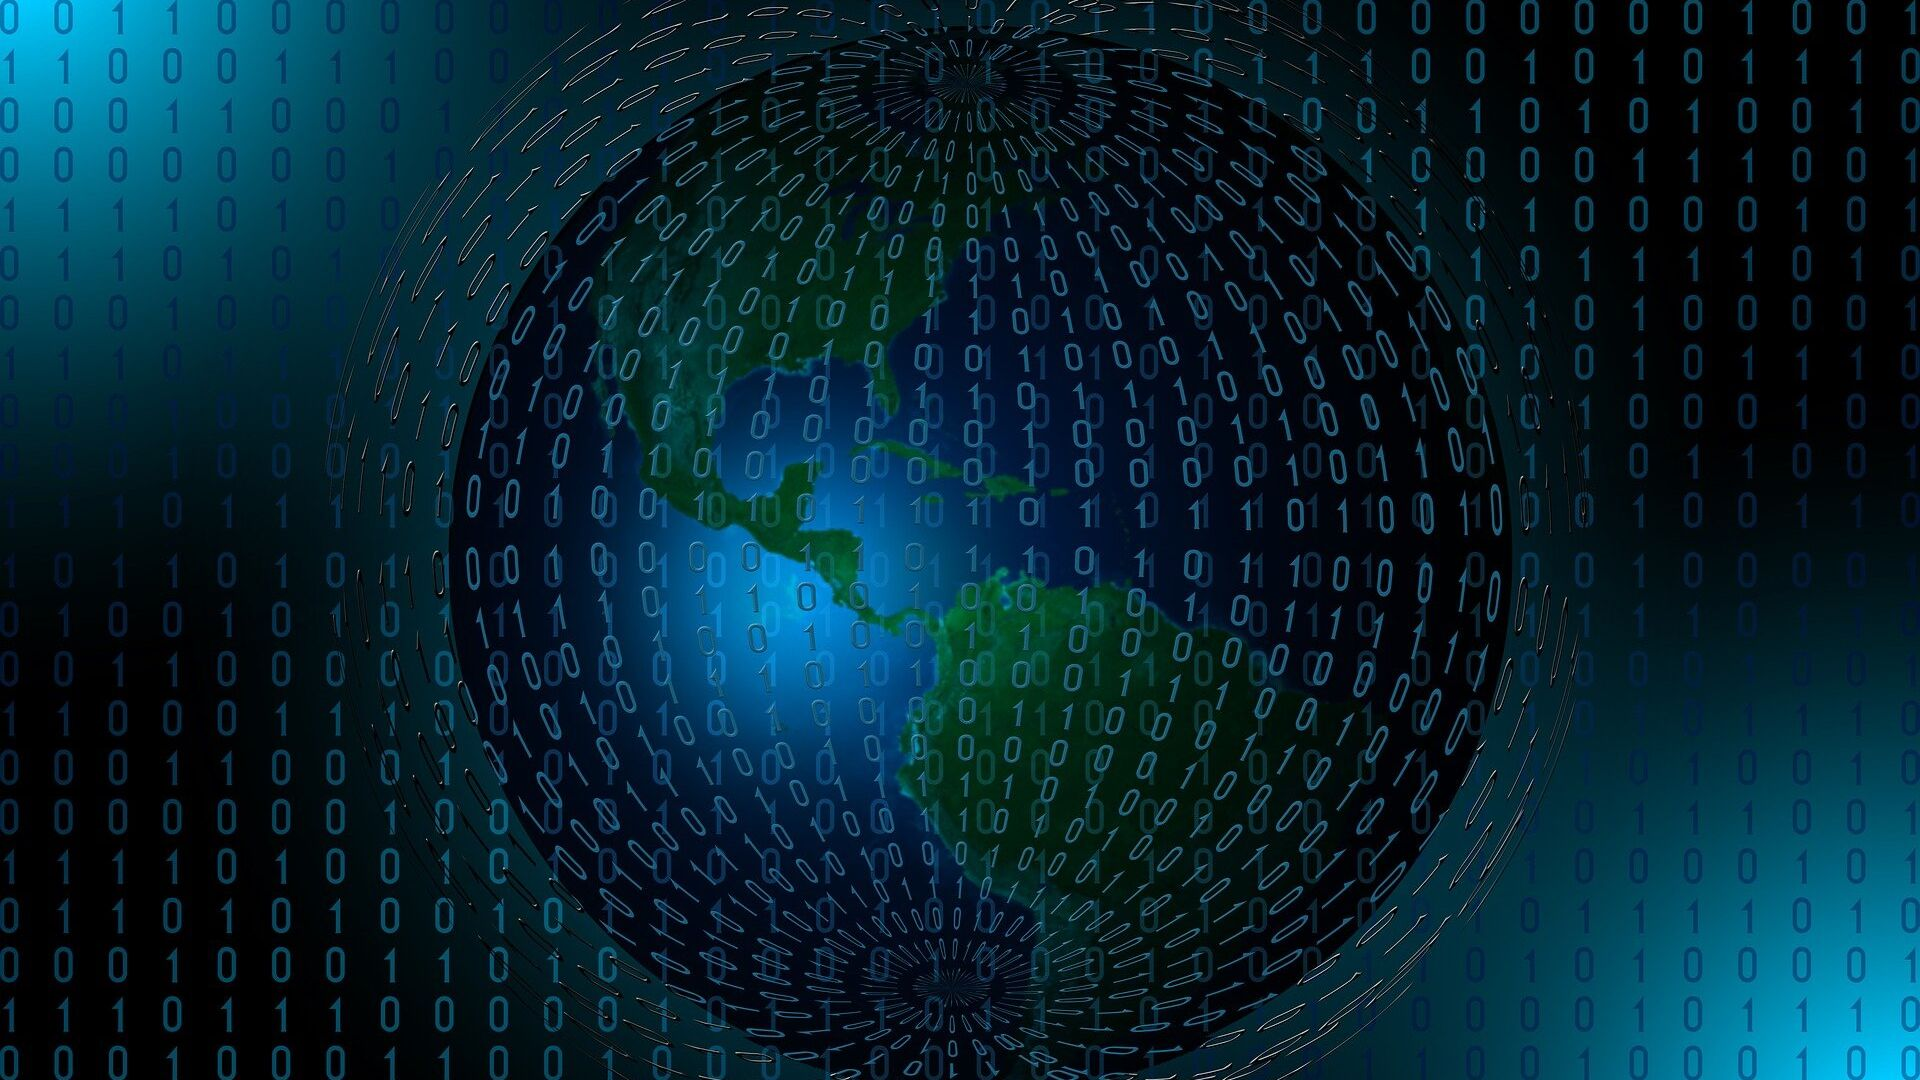 Ciberseguridad (imagen referencial) - Sputnik Mundo, 1920, 28.06.2021